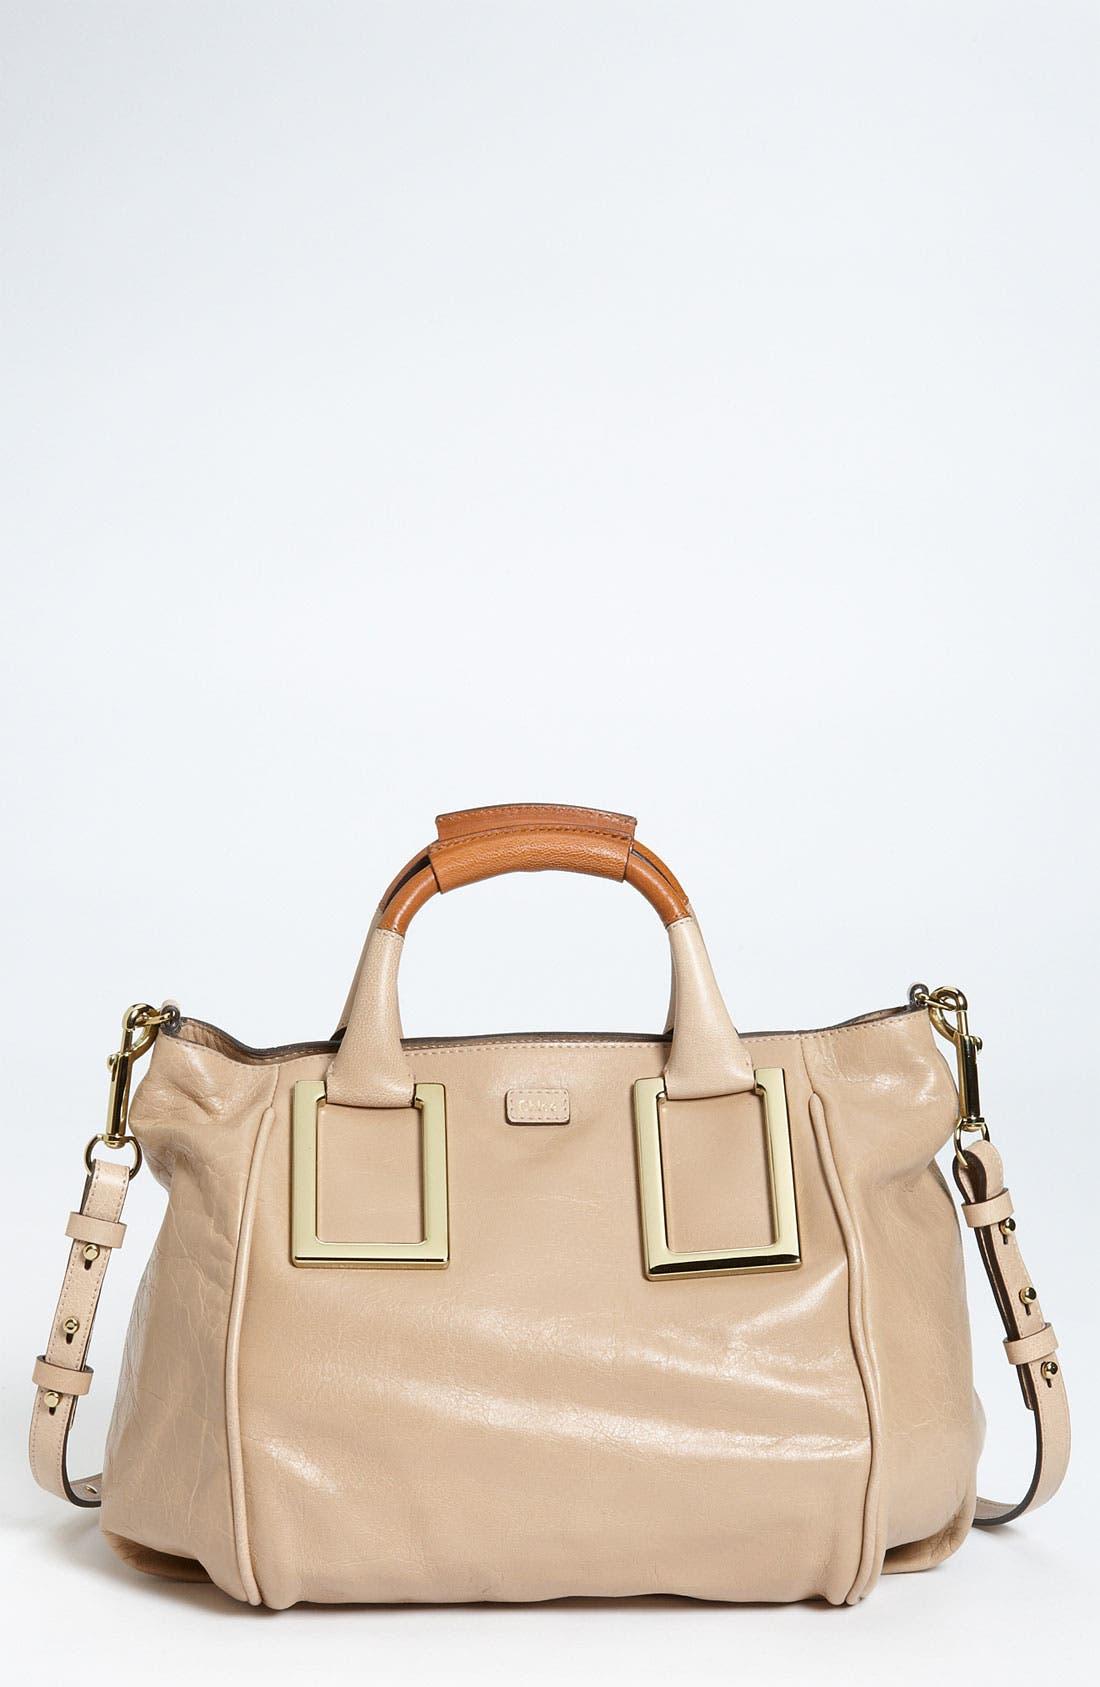 Alternate Image 1 Selected - Chloé 'Ethel - Medium' Leather Satchel